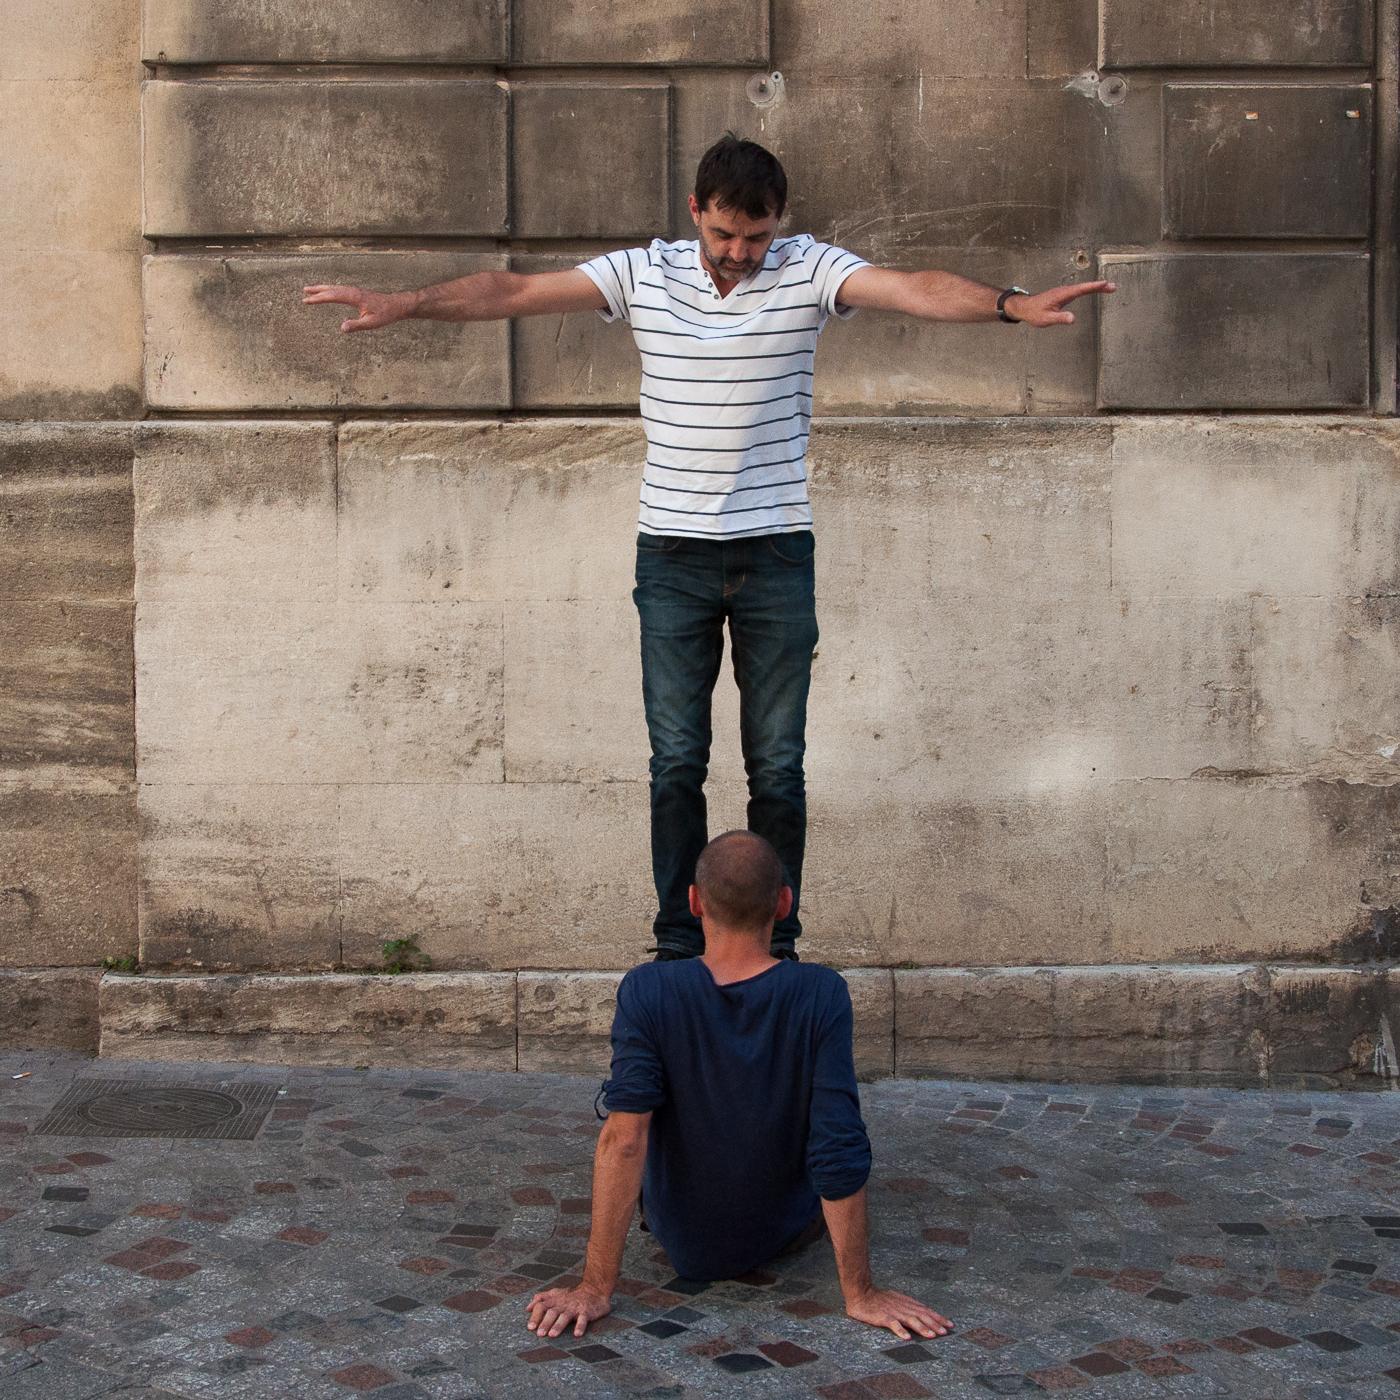 Arles_2015_-_Le_Christ_de_Stéphanie